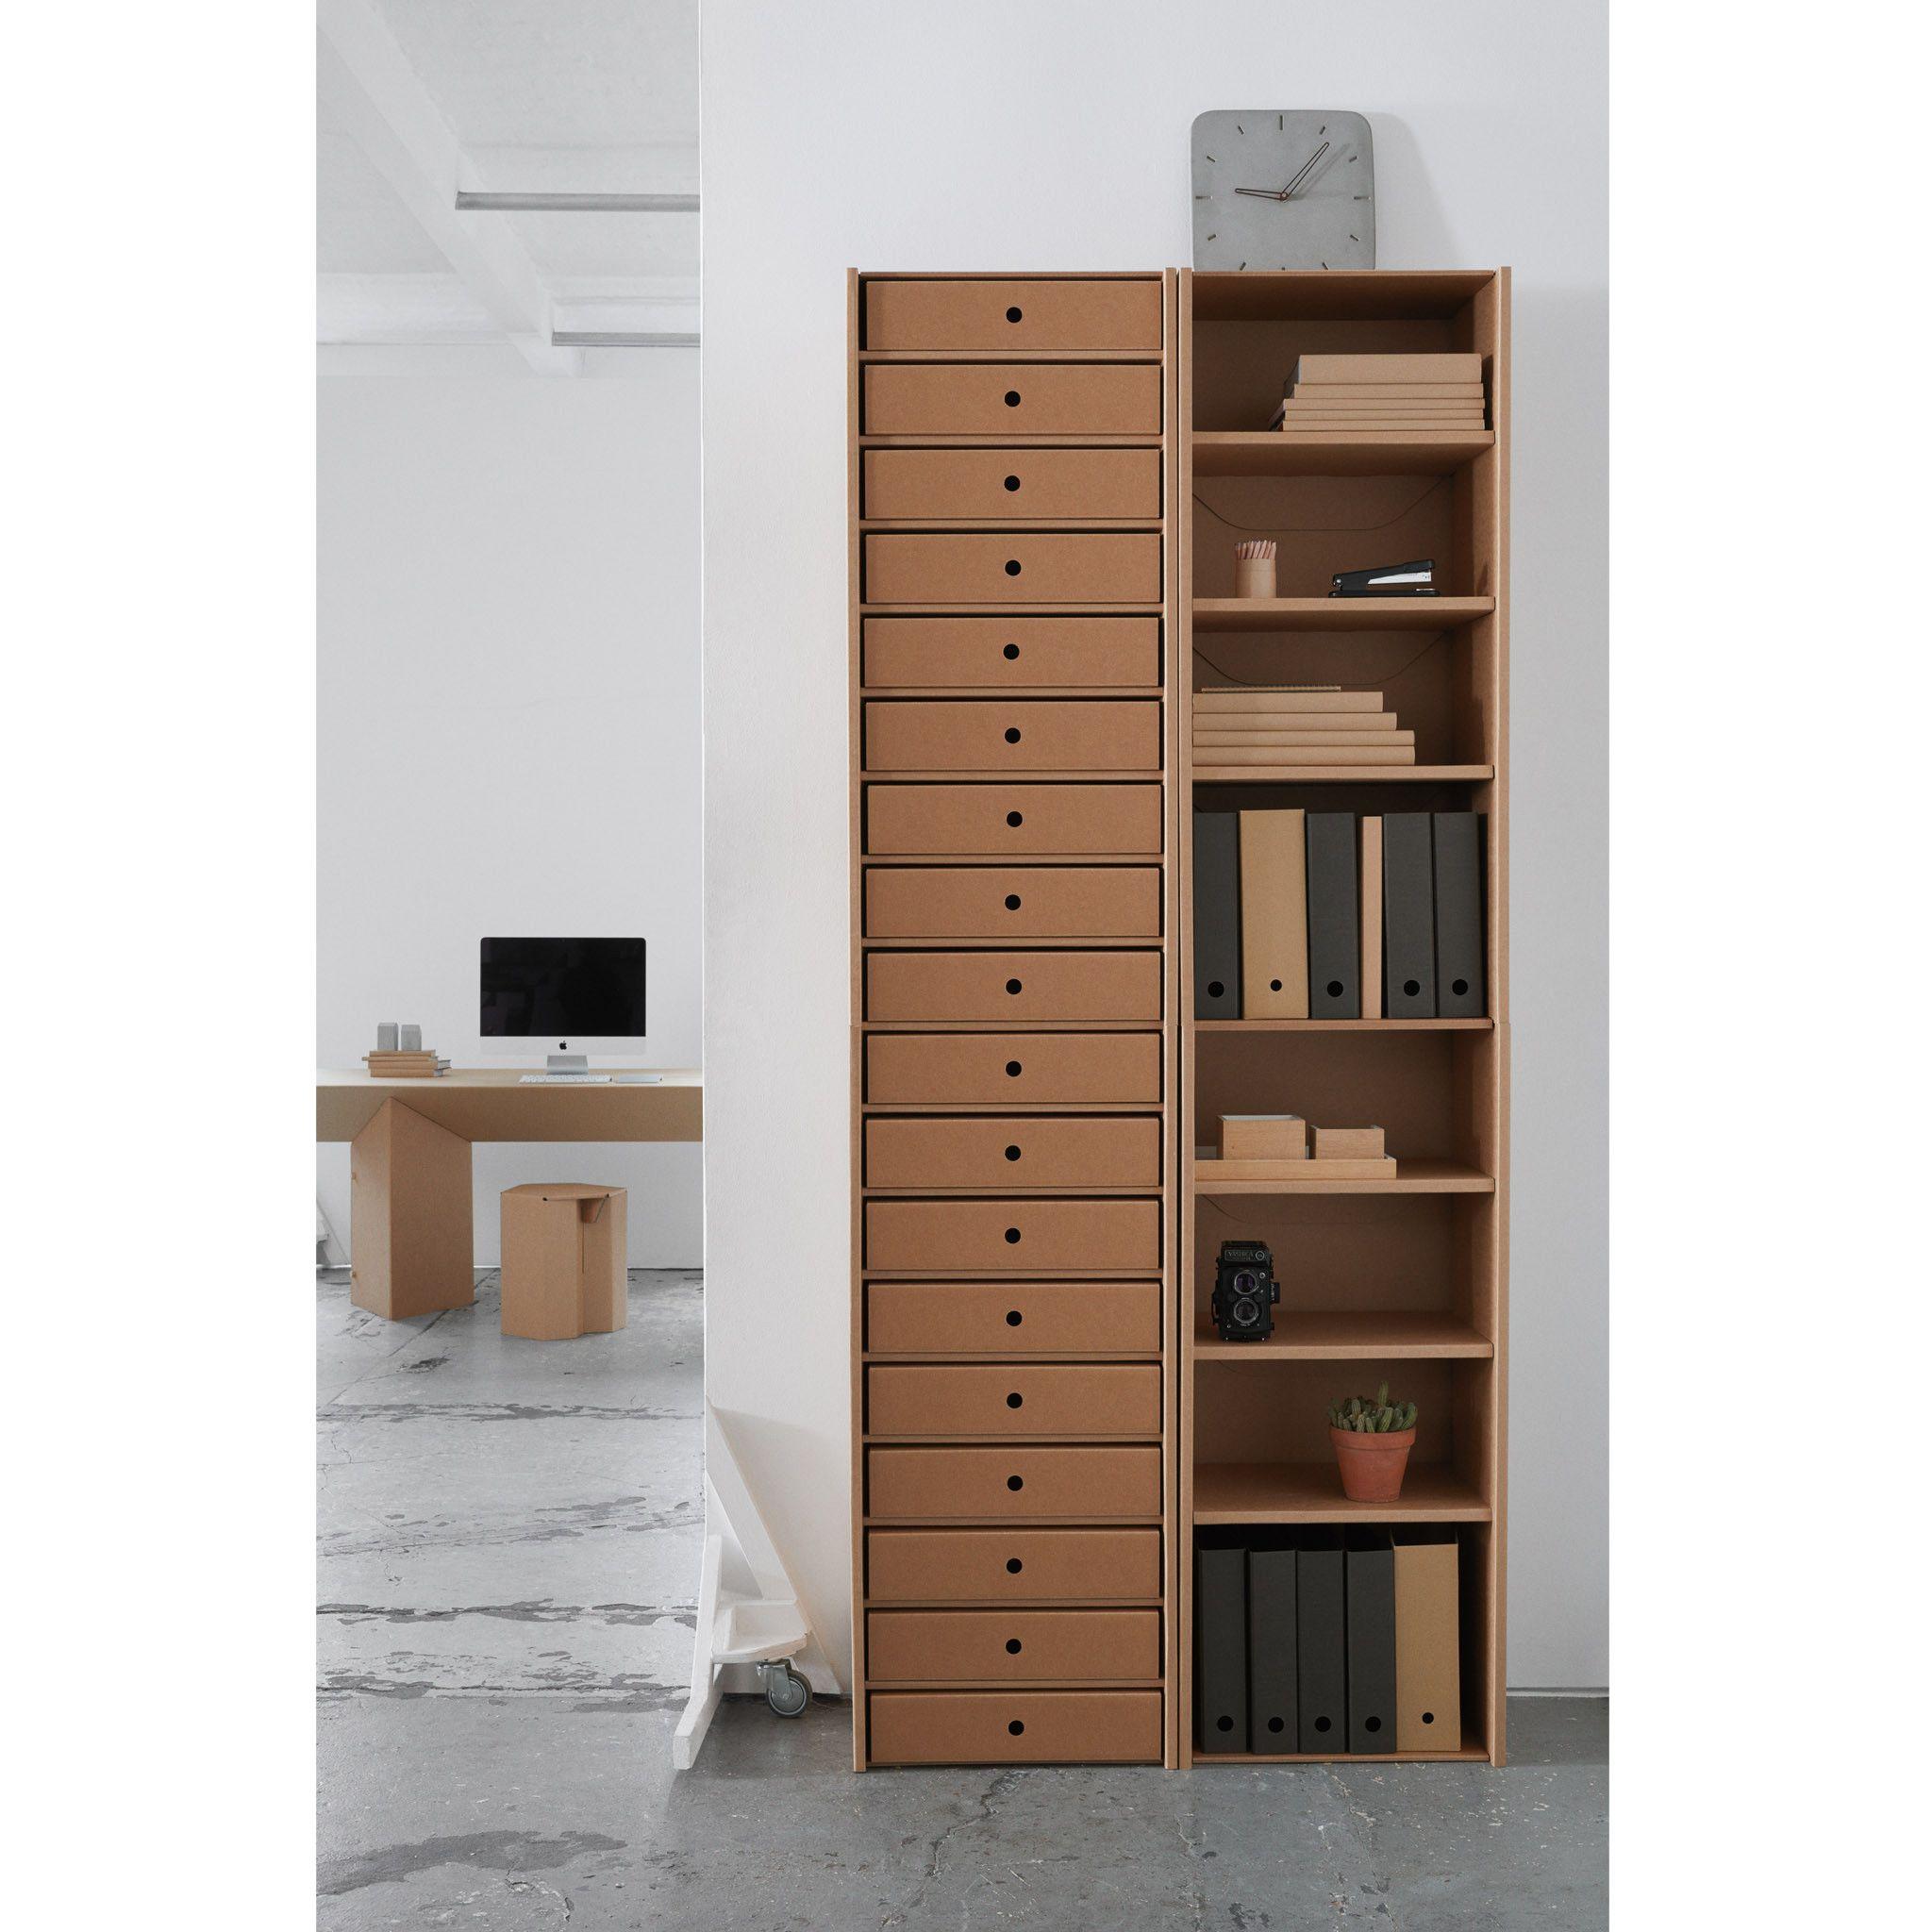 regal a3 wolf paperworld pinterest stangen pappe und wolf. Black Bedroom Furniture Sets. Home Design Ideas